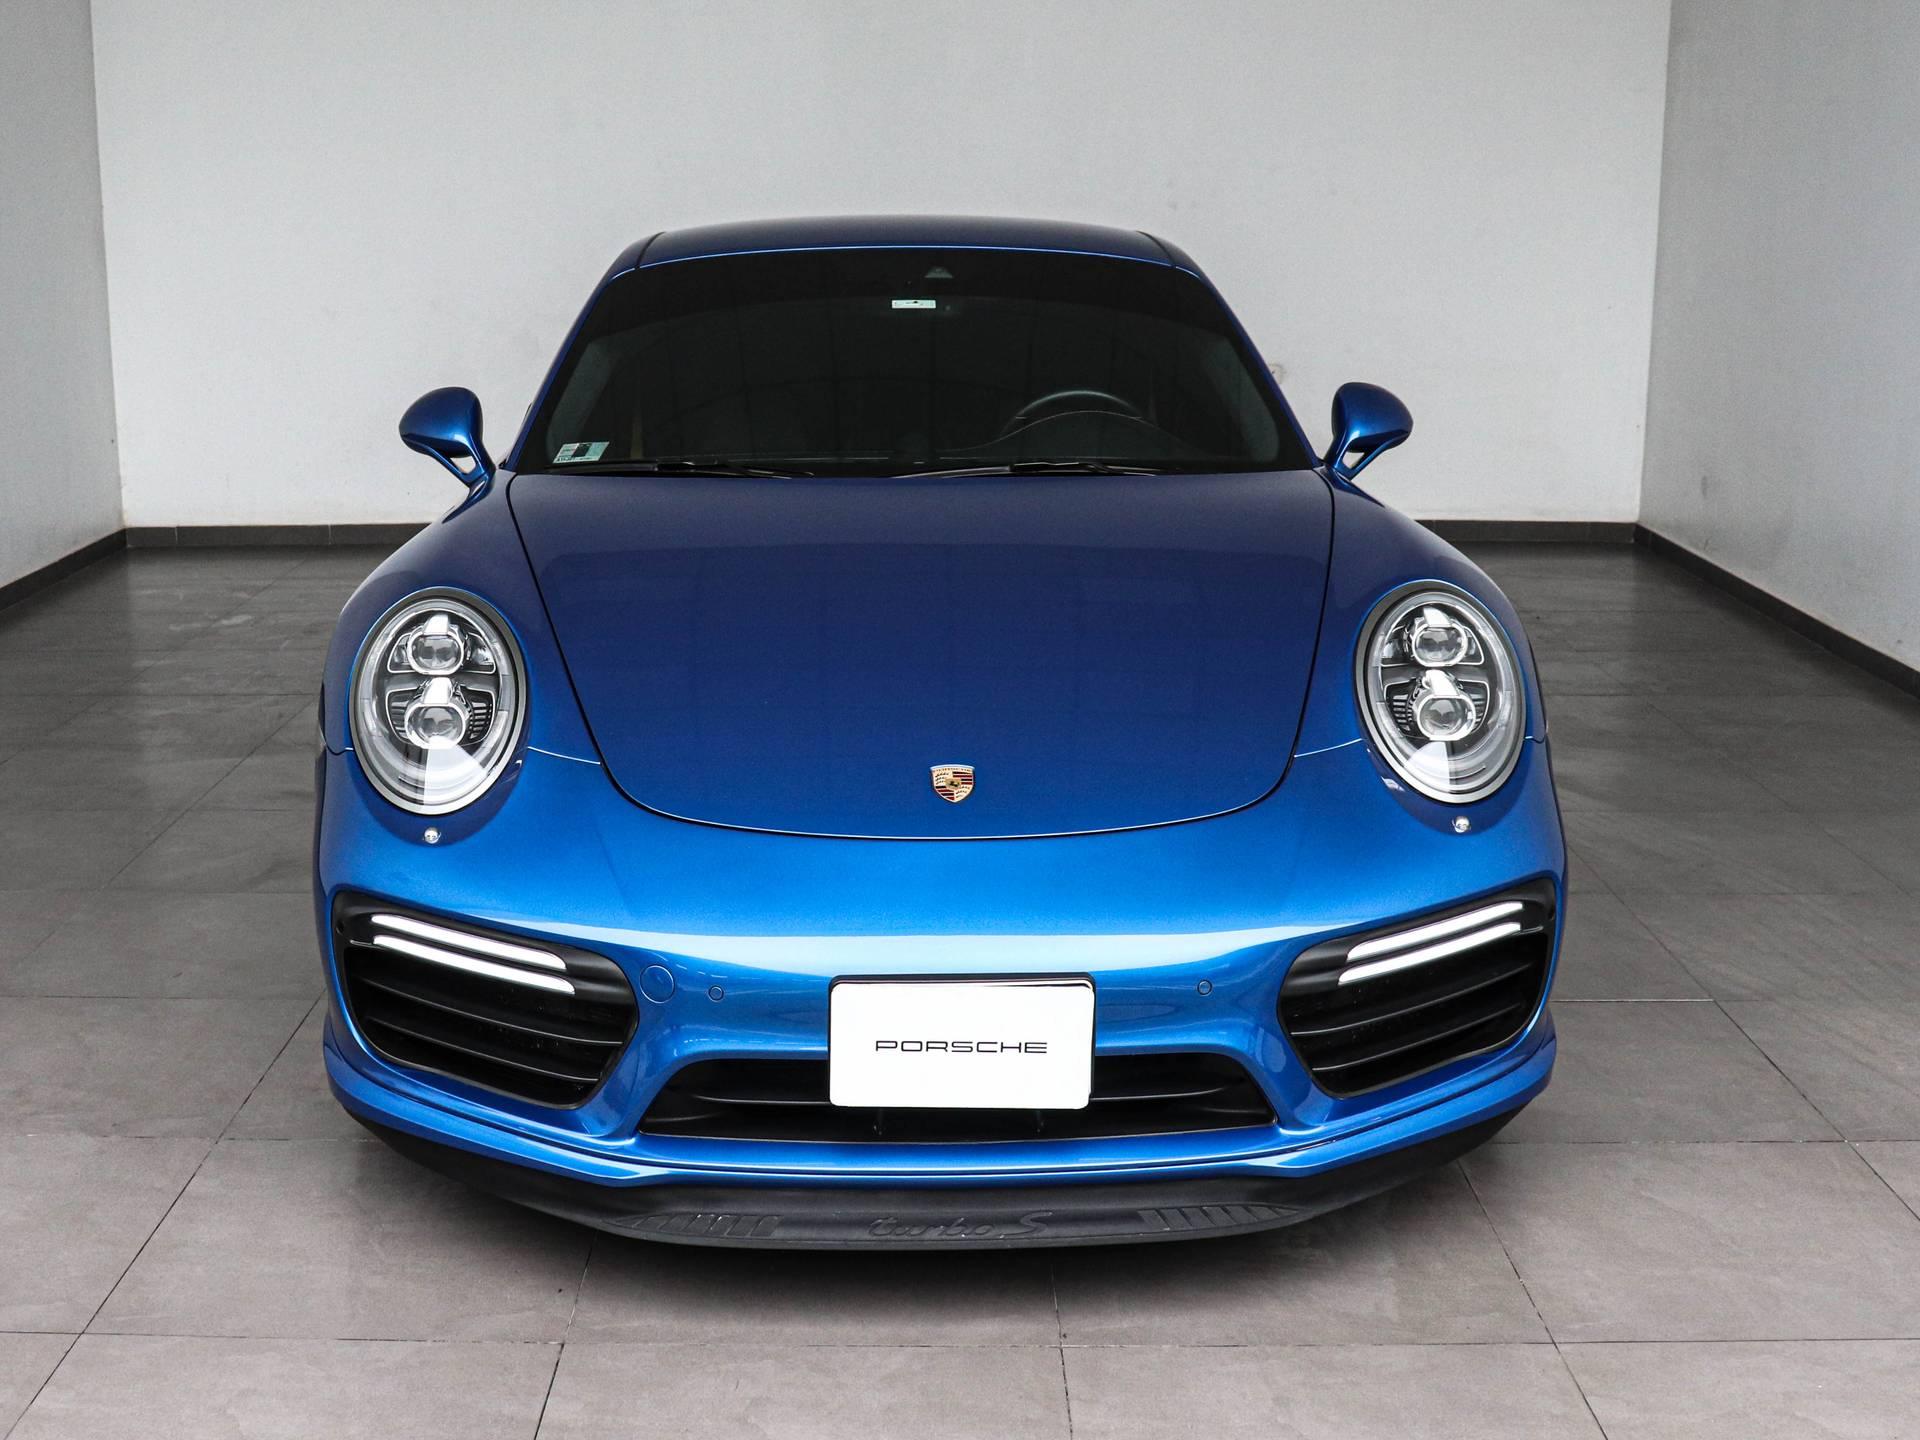 2017 Porsche 911 Turbo S – 5